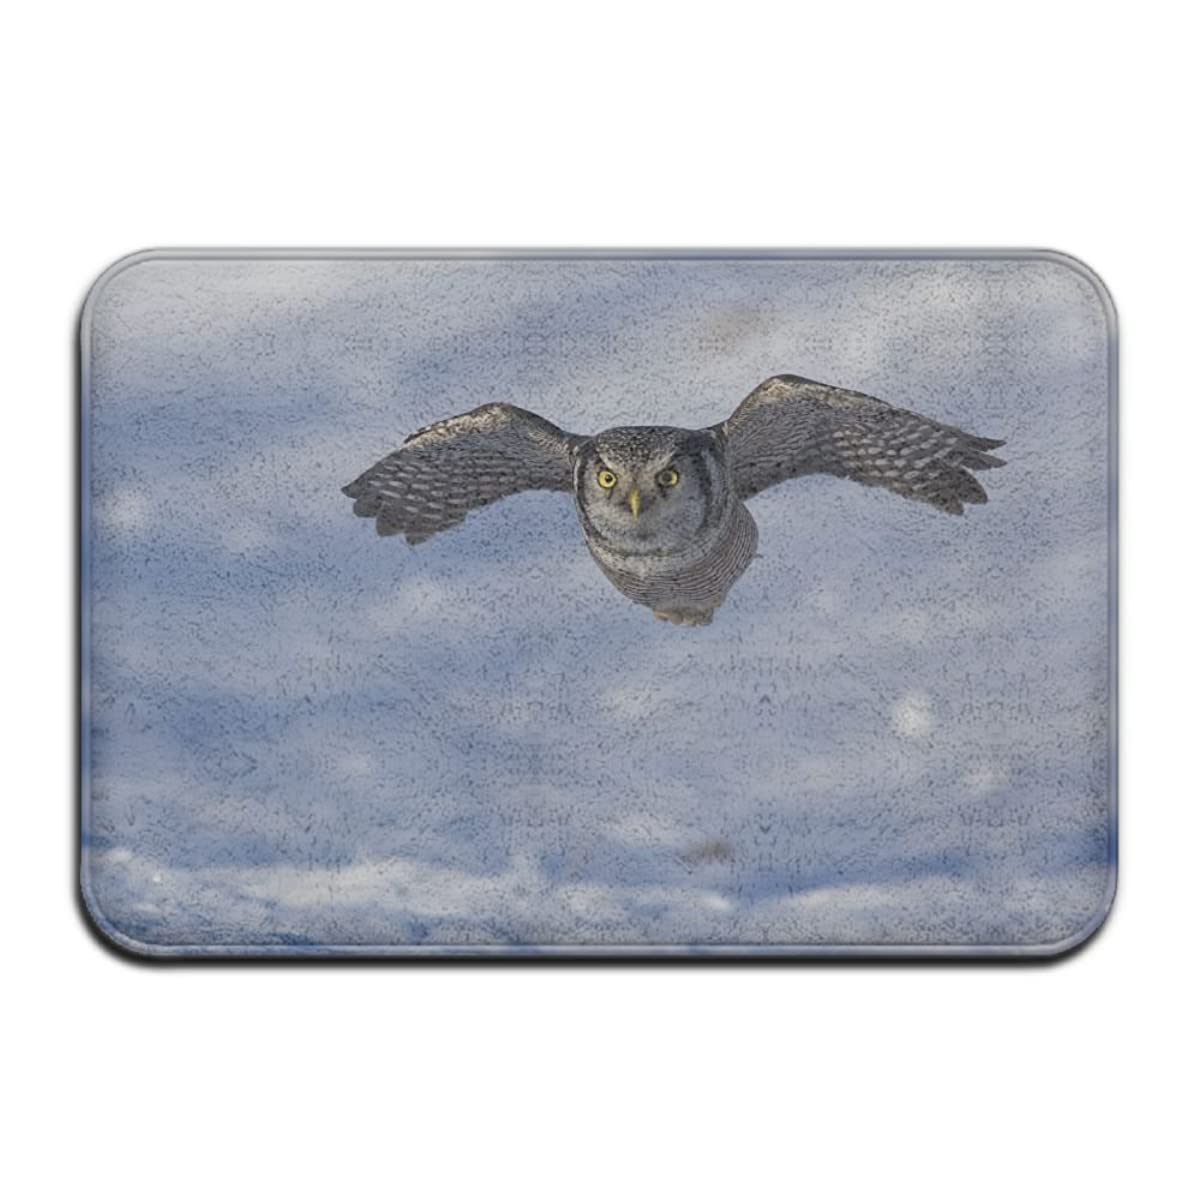 FTRGRAFE Snown Fat Hawk Owls Home Door Mat Super Absorbent Non Slip Front Floor Mat,Soft Coral Memory Foam Carpet Bathroom Rubber Entrance Rugs For Indoor Outdoor